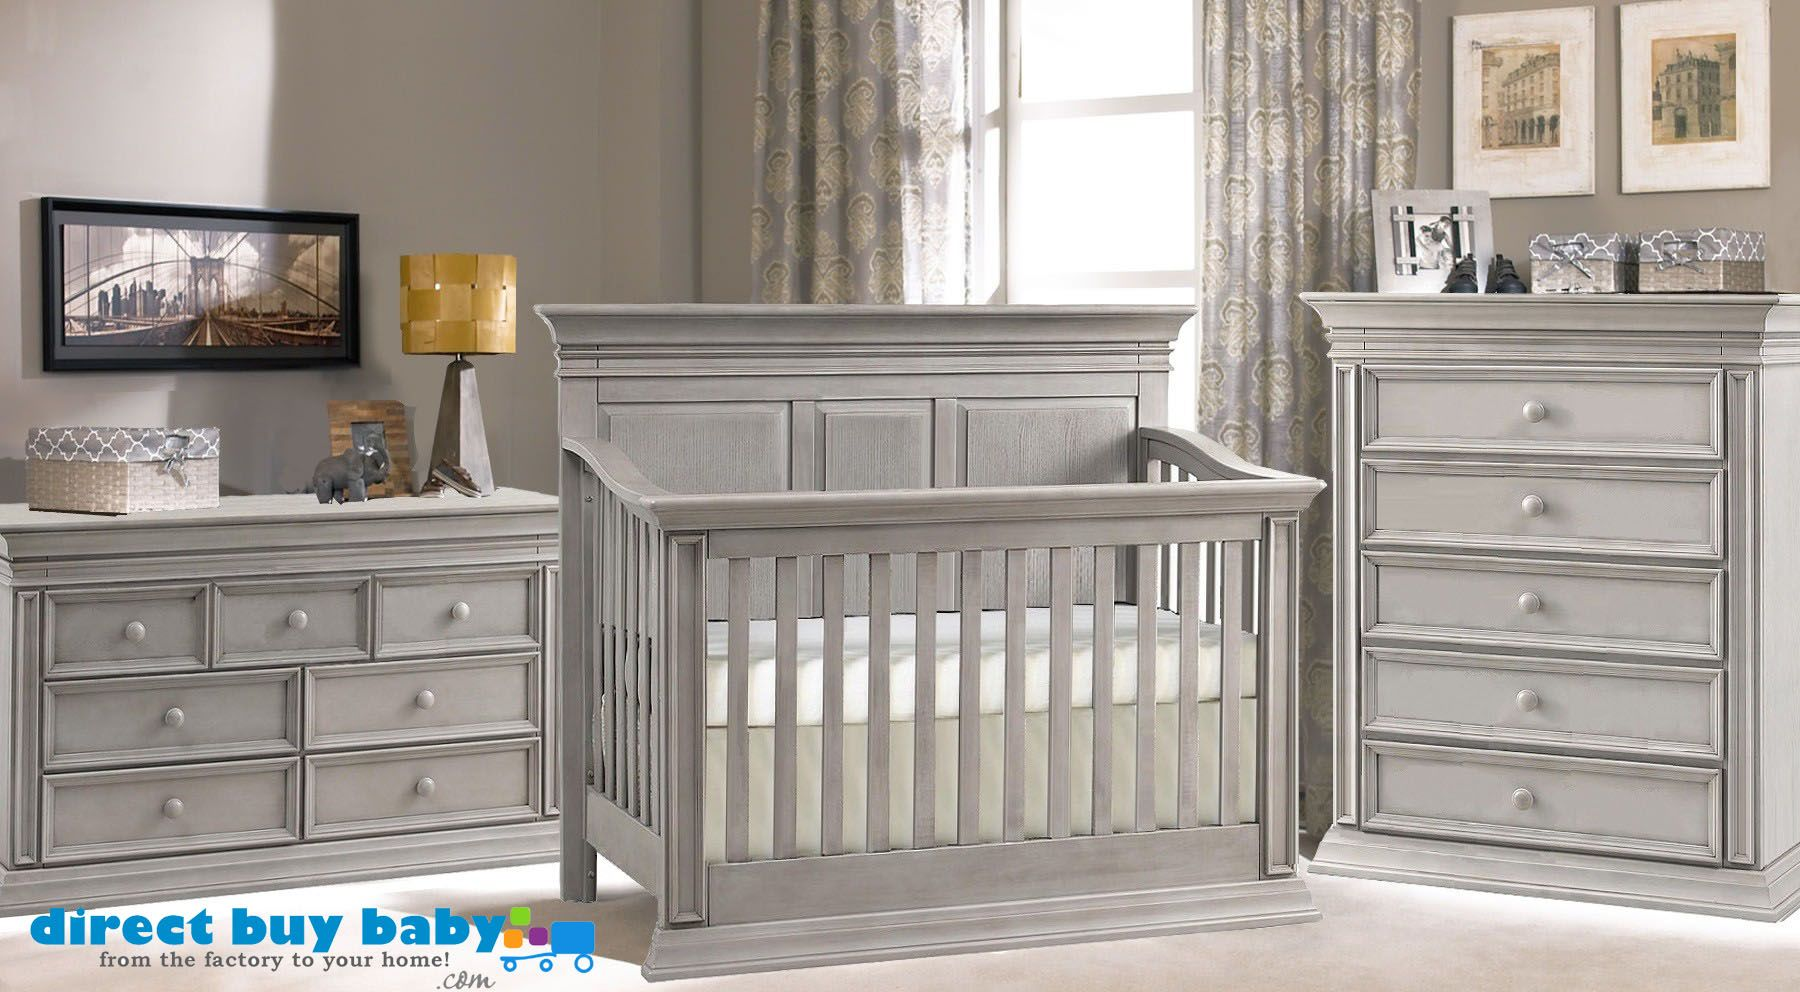 Elegant Distressed Grey Rustic Nursery Set I Direct Buy Baby I